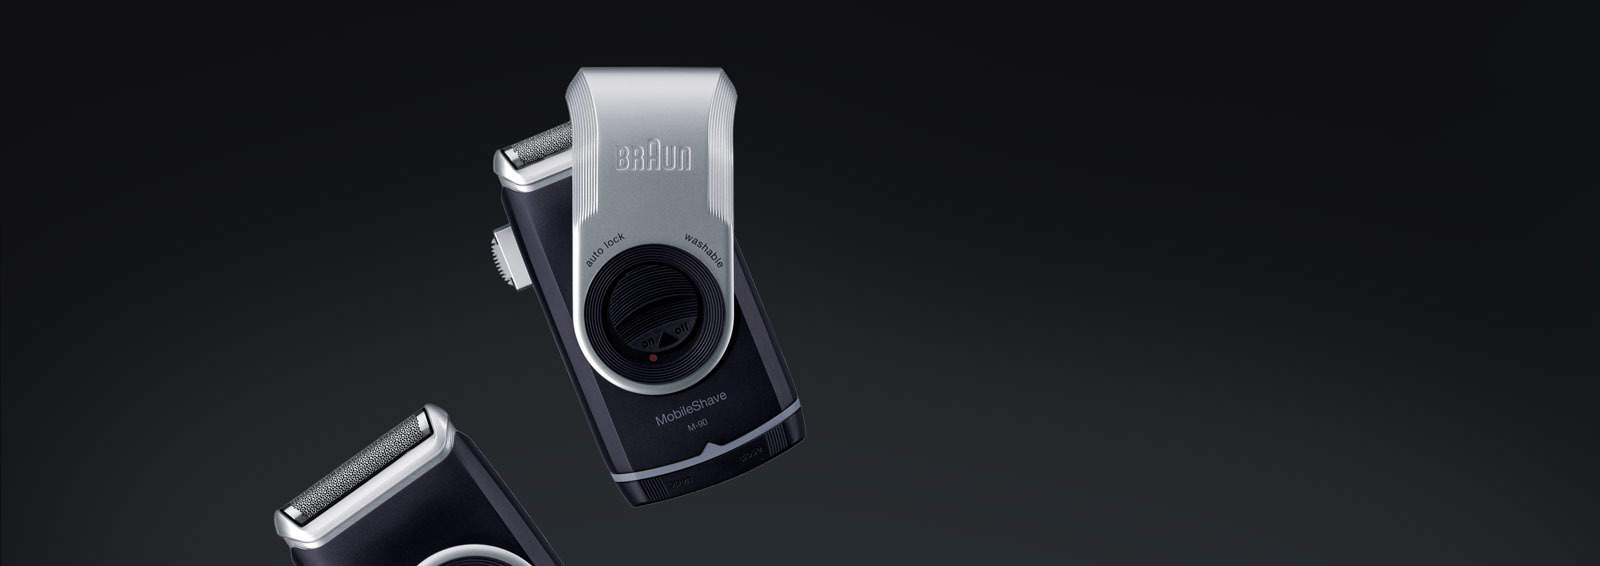 Braun MobileShave: A super portable, travel-friendly shaver